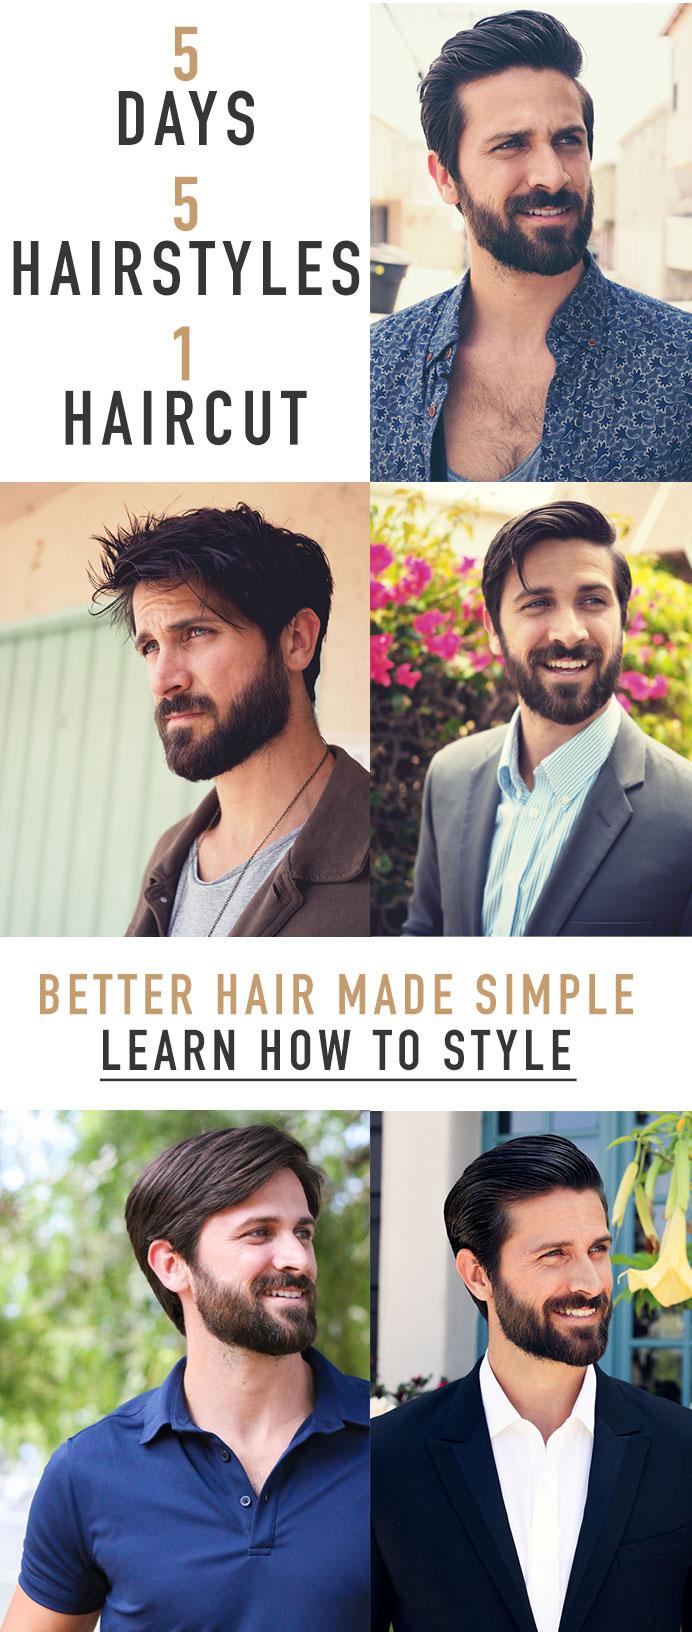 5 Days, 5 Hairstyles, 1 Haircut